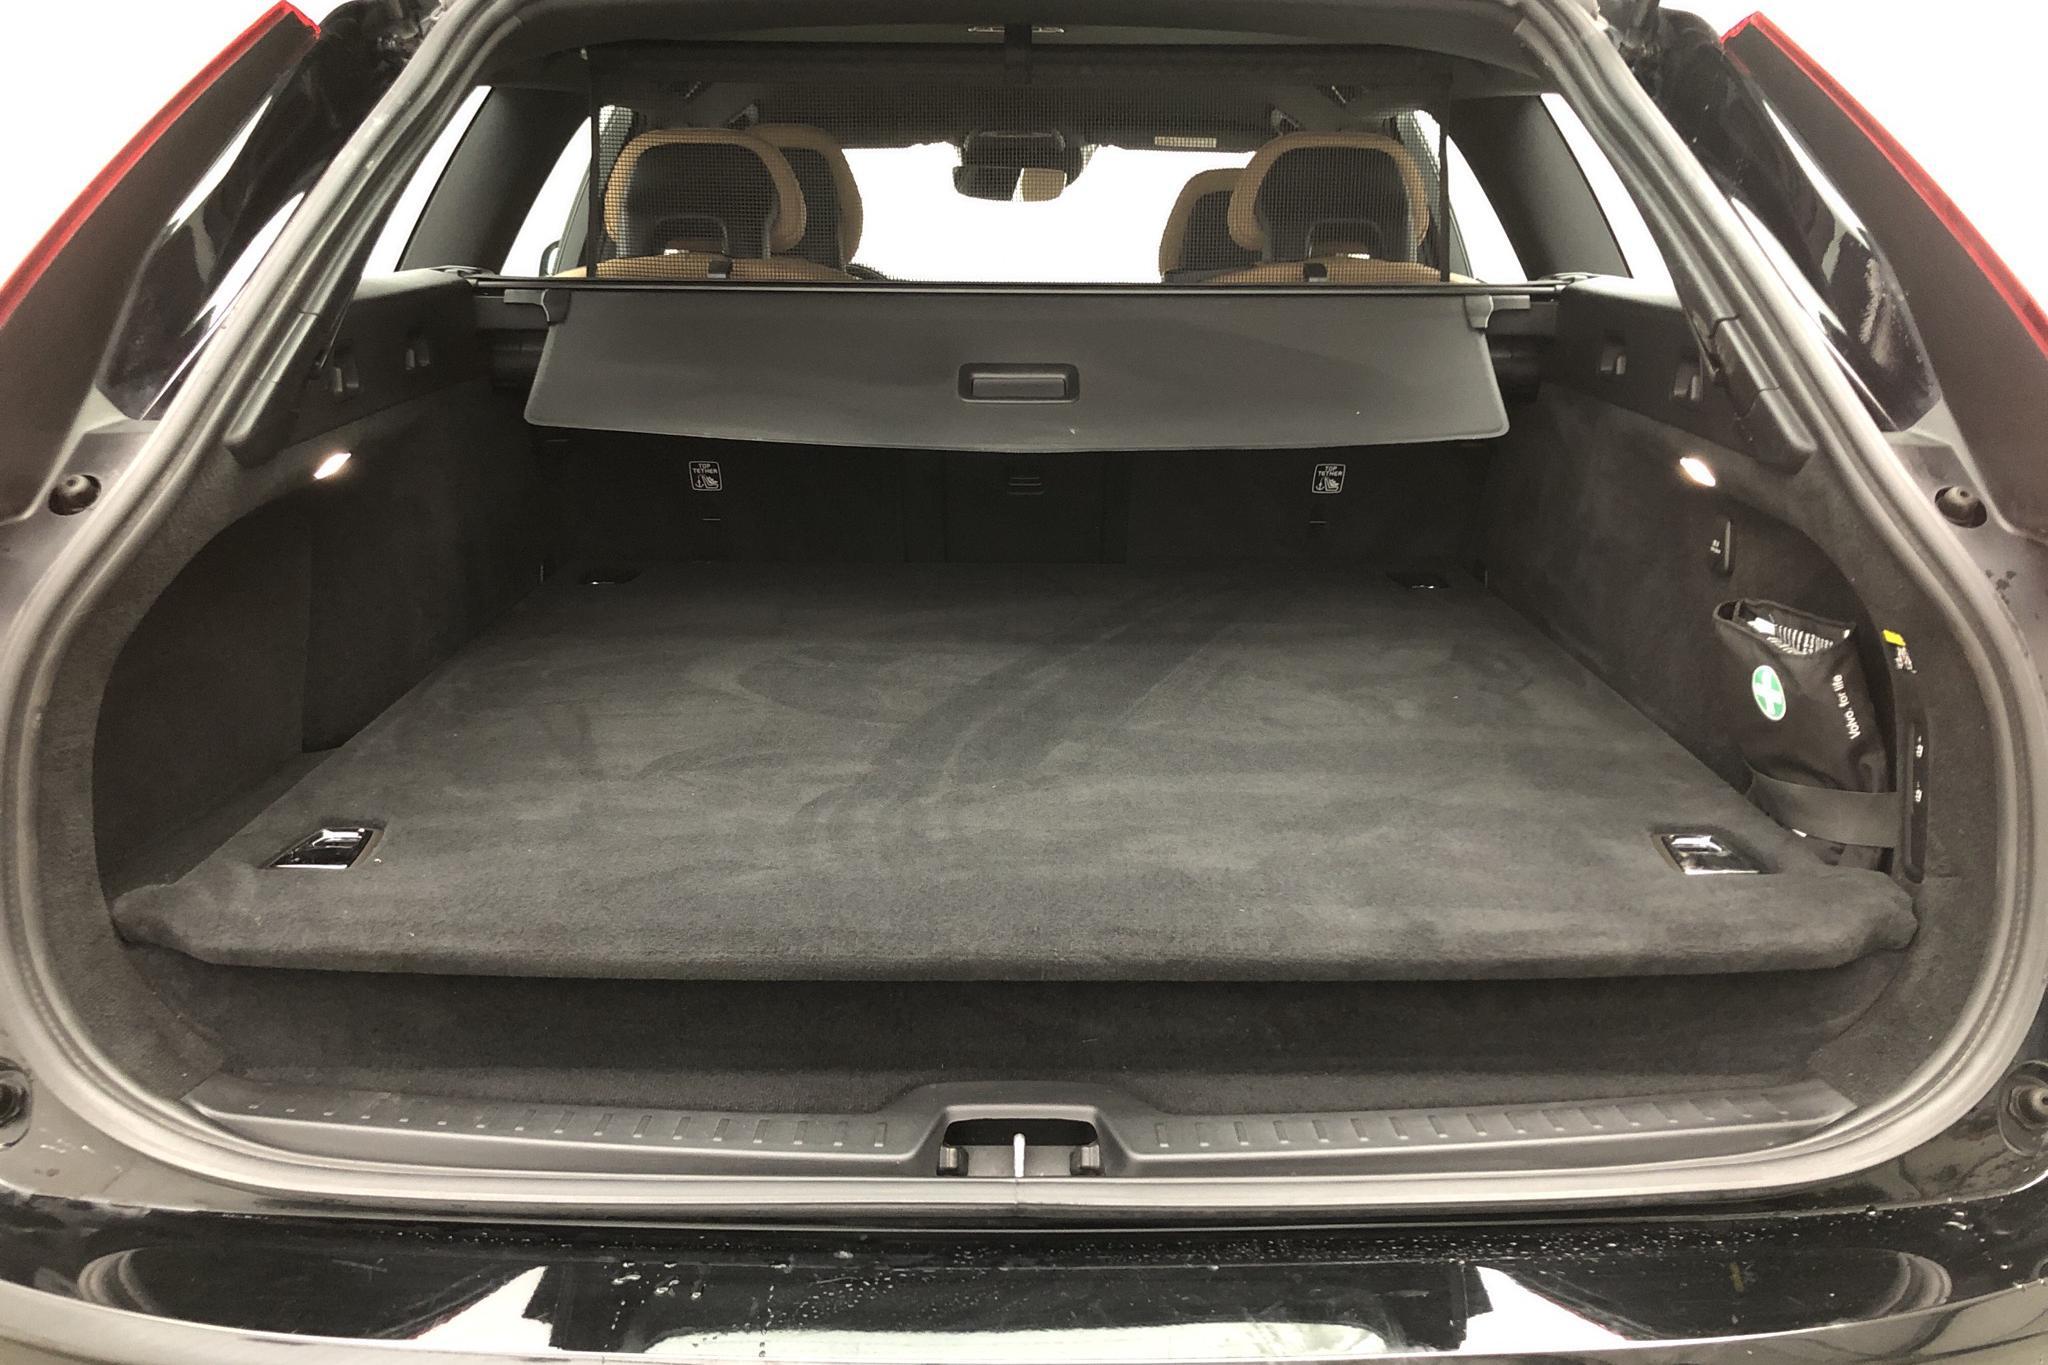 Volvo V90 T5 (254hk) - 37 120 km - Automatic - black - 2018